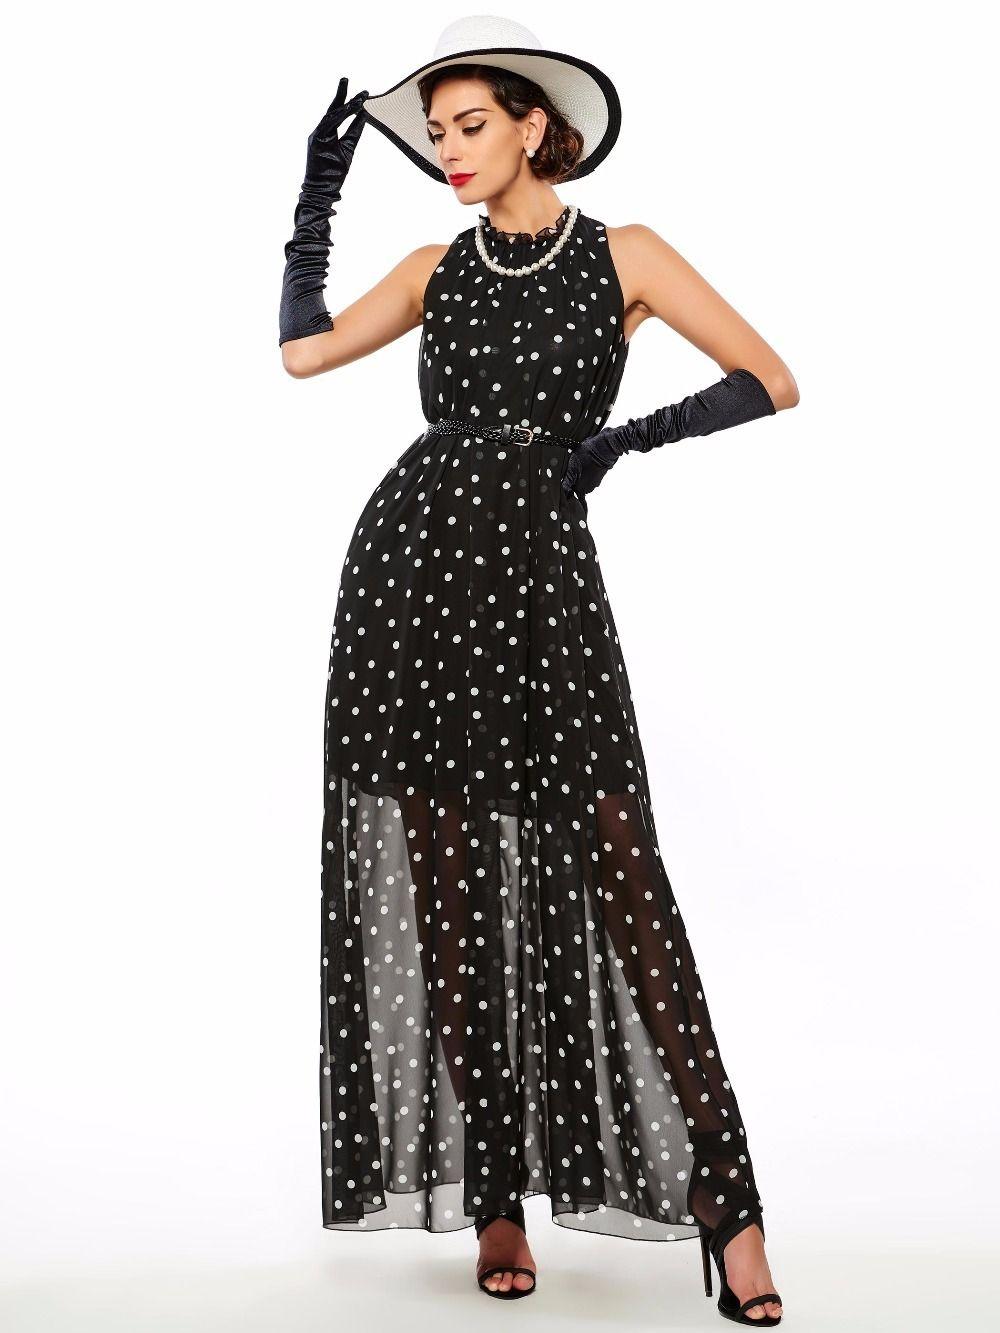 Grosshandel Gothic Maxi Kleid Frauen Sommer Schwarz Dot Oansatz